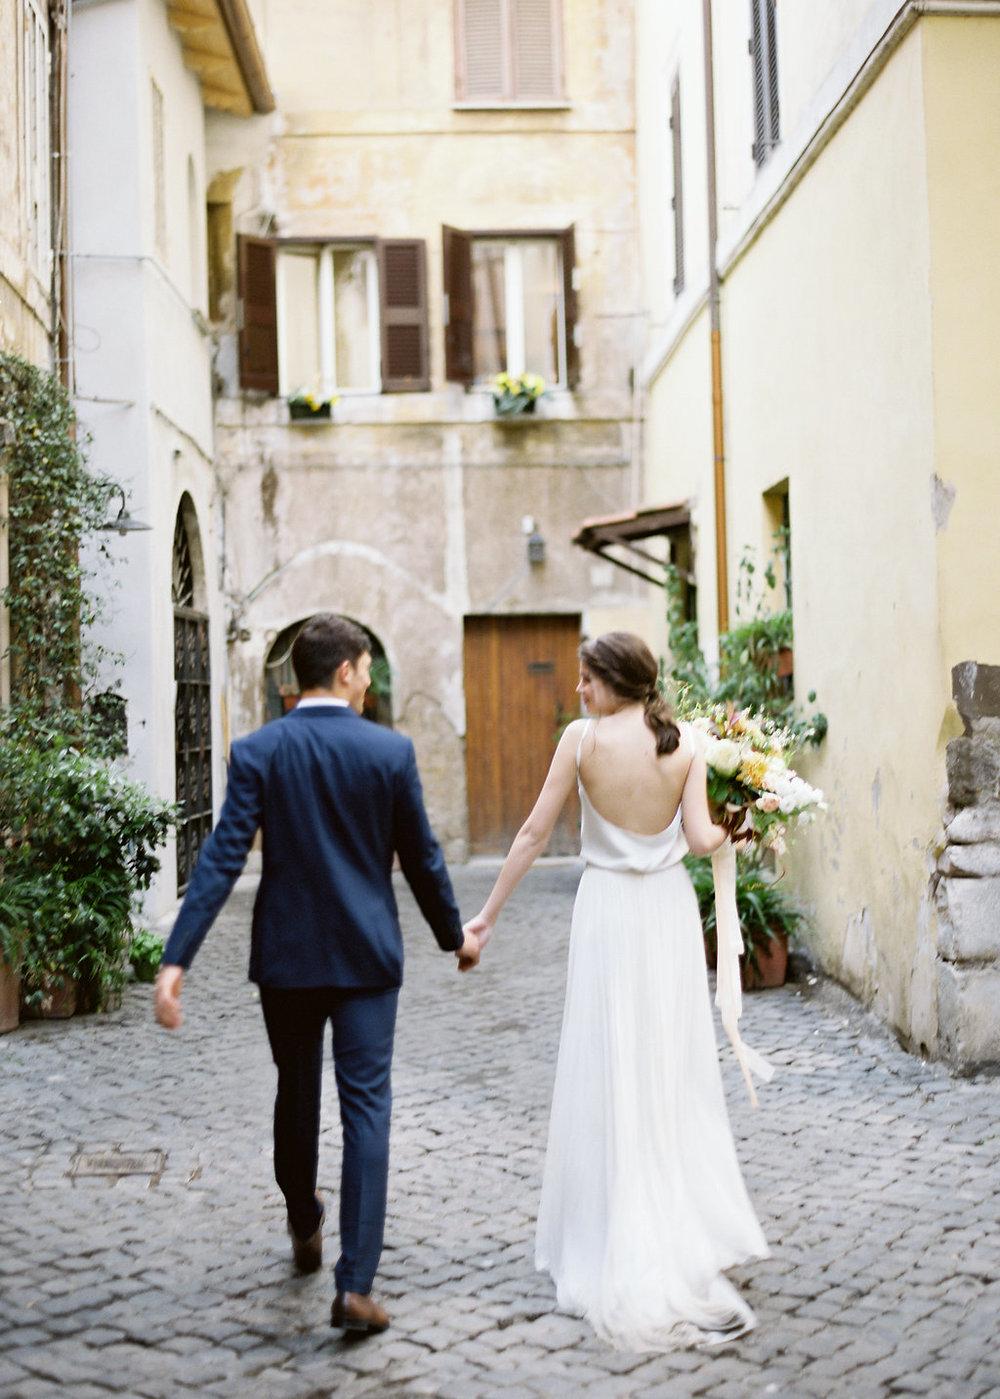 Vicki_Grafton_Photography_Rome_Italy_Wedding_Photographer_2017-145.jpg